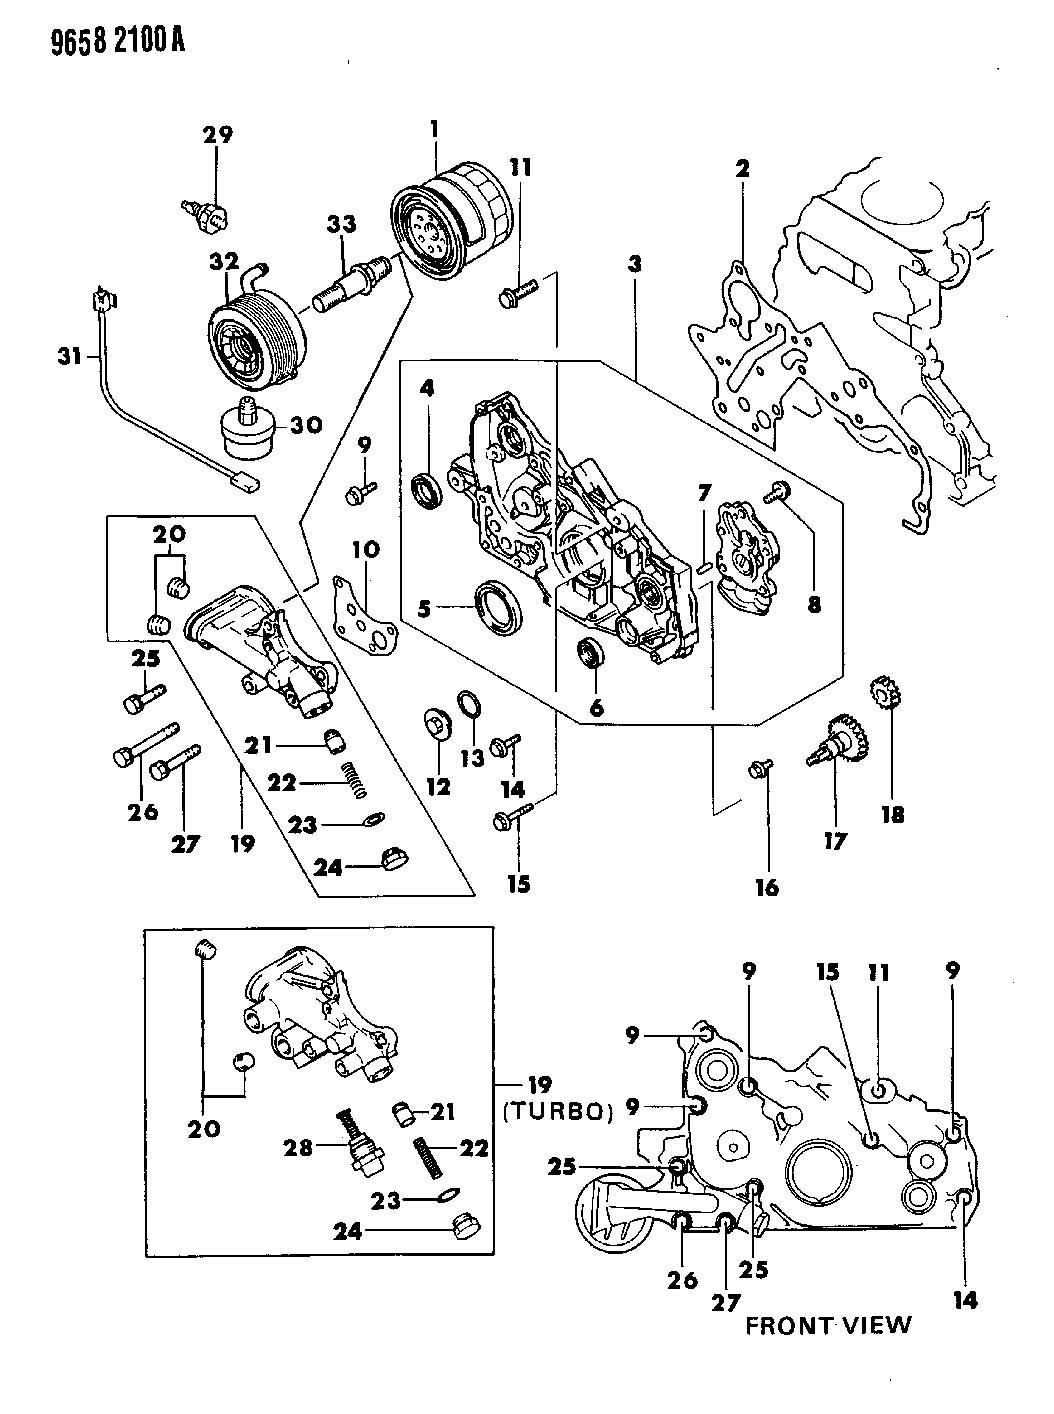 Buick Roadmaster Wiring Diagram